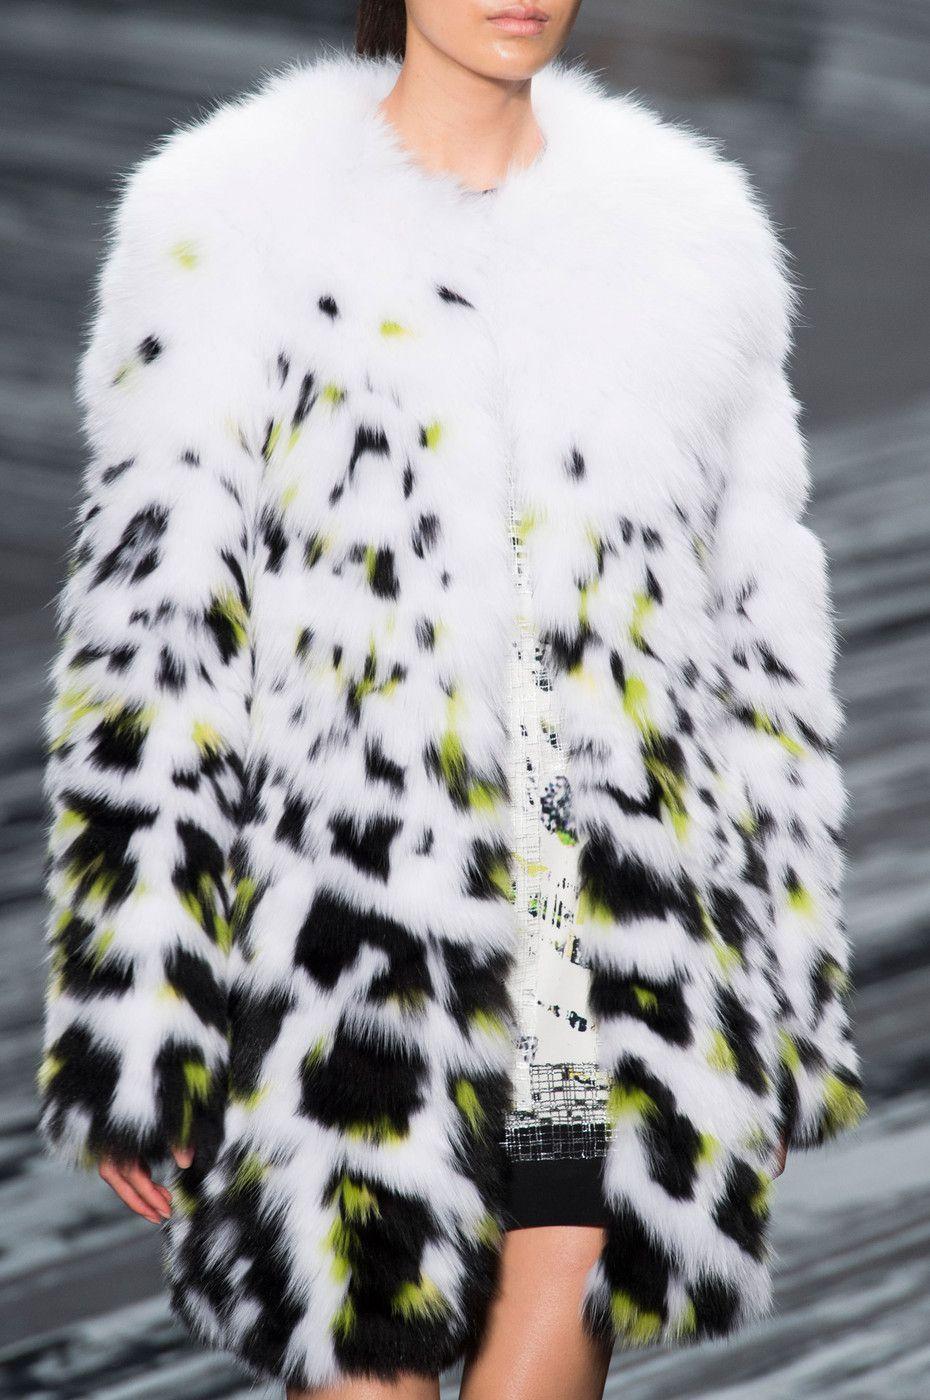 J. Mendel - New York Fashion Week - Spring 2015